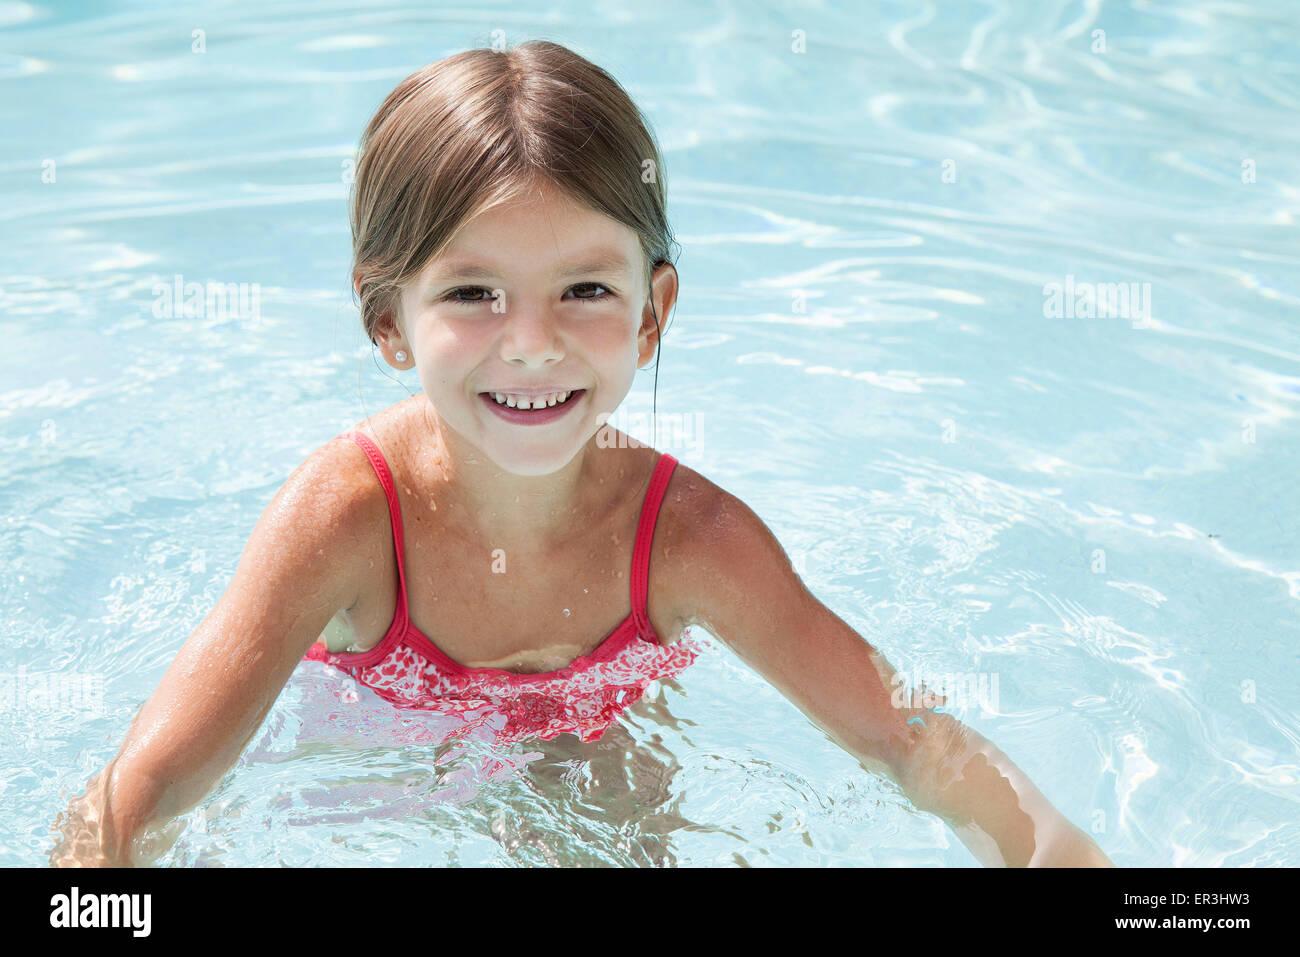 Girl swimming in pool, portrait Photo Stock